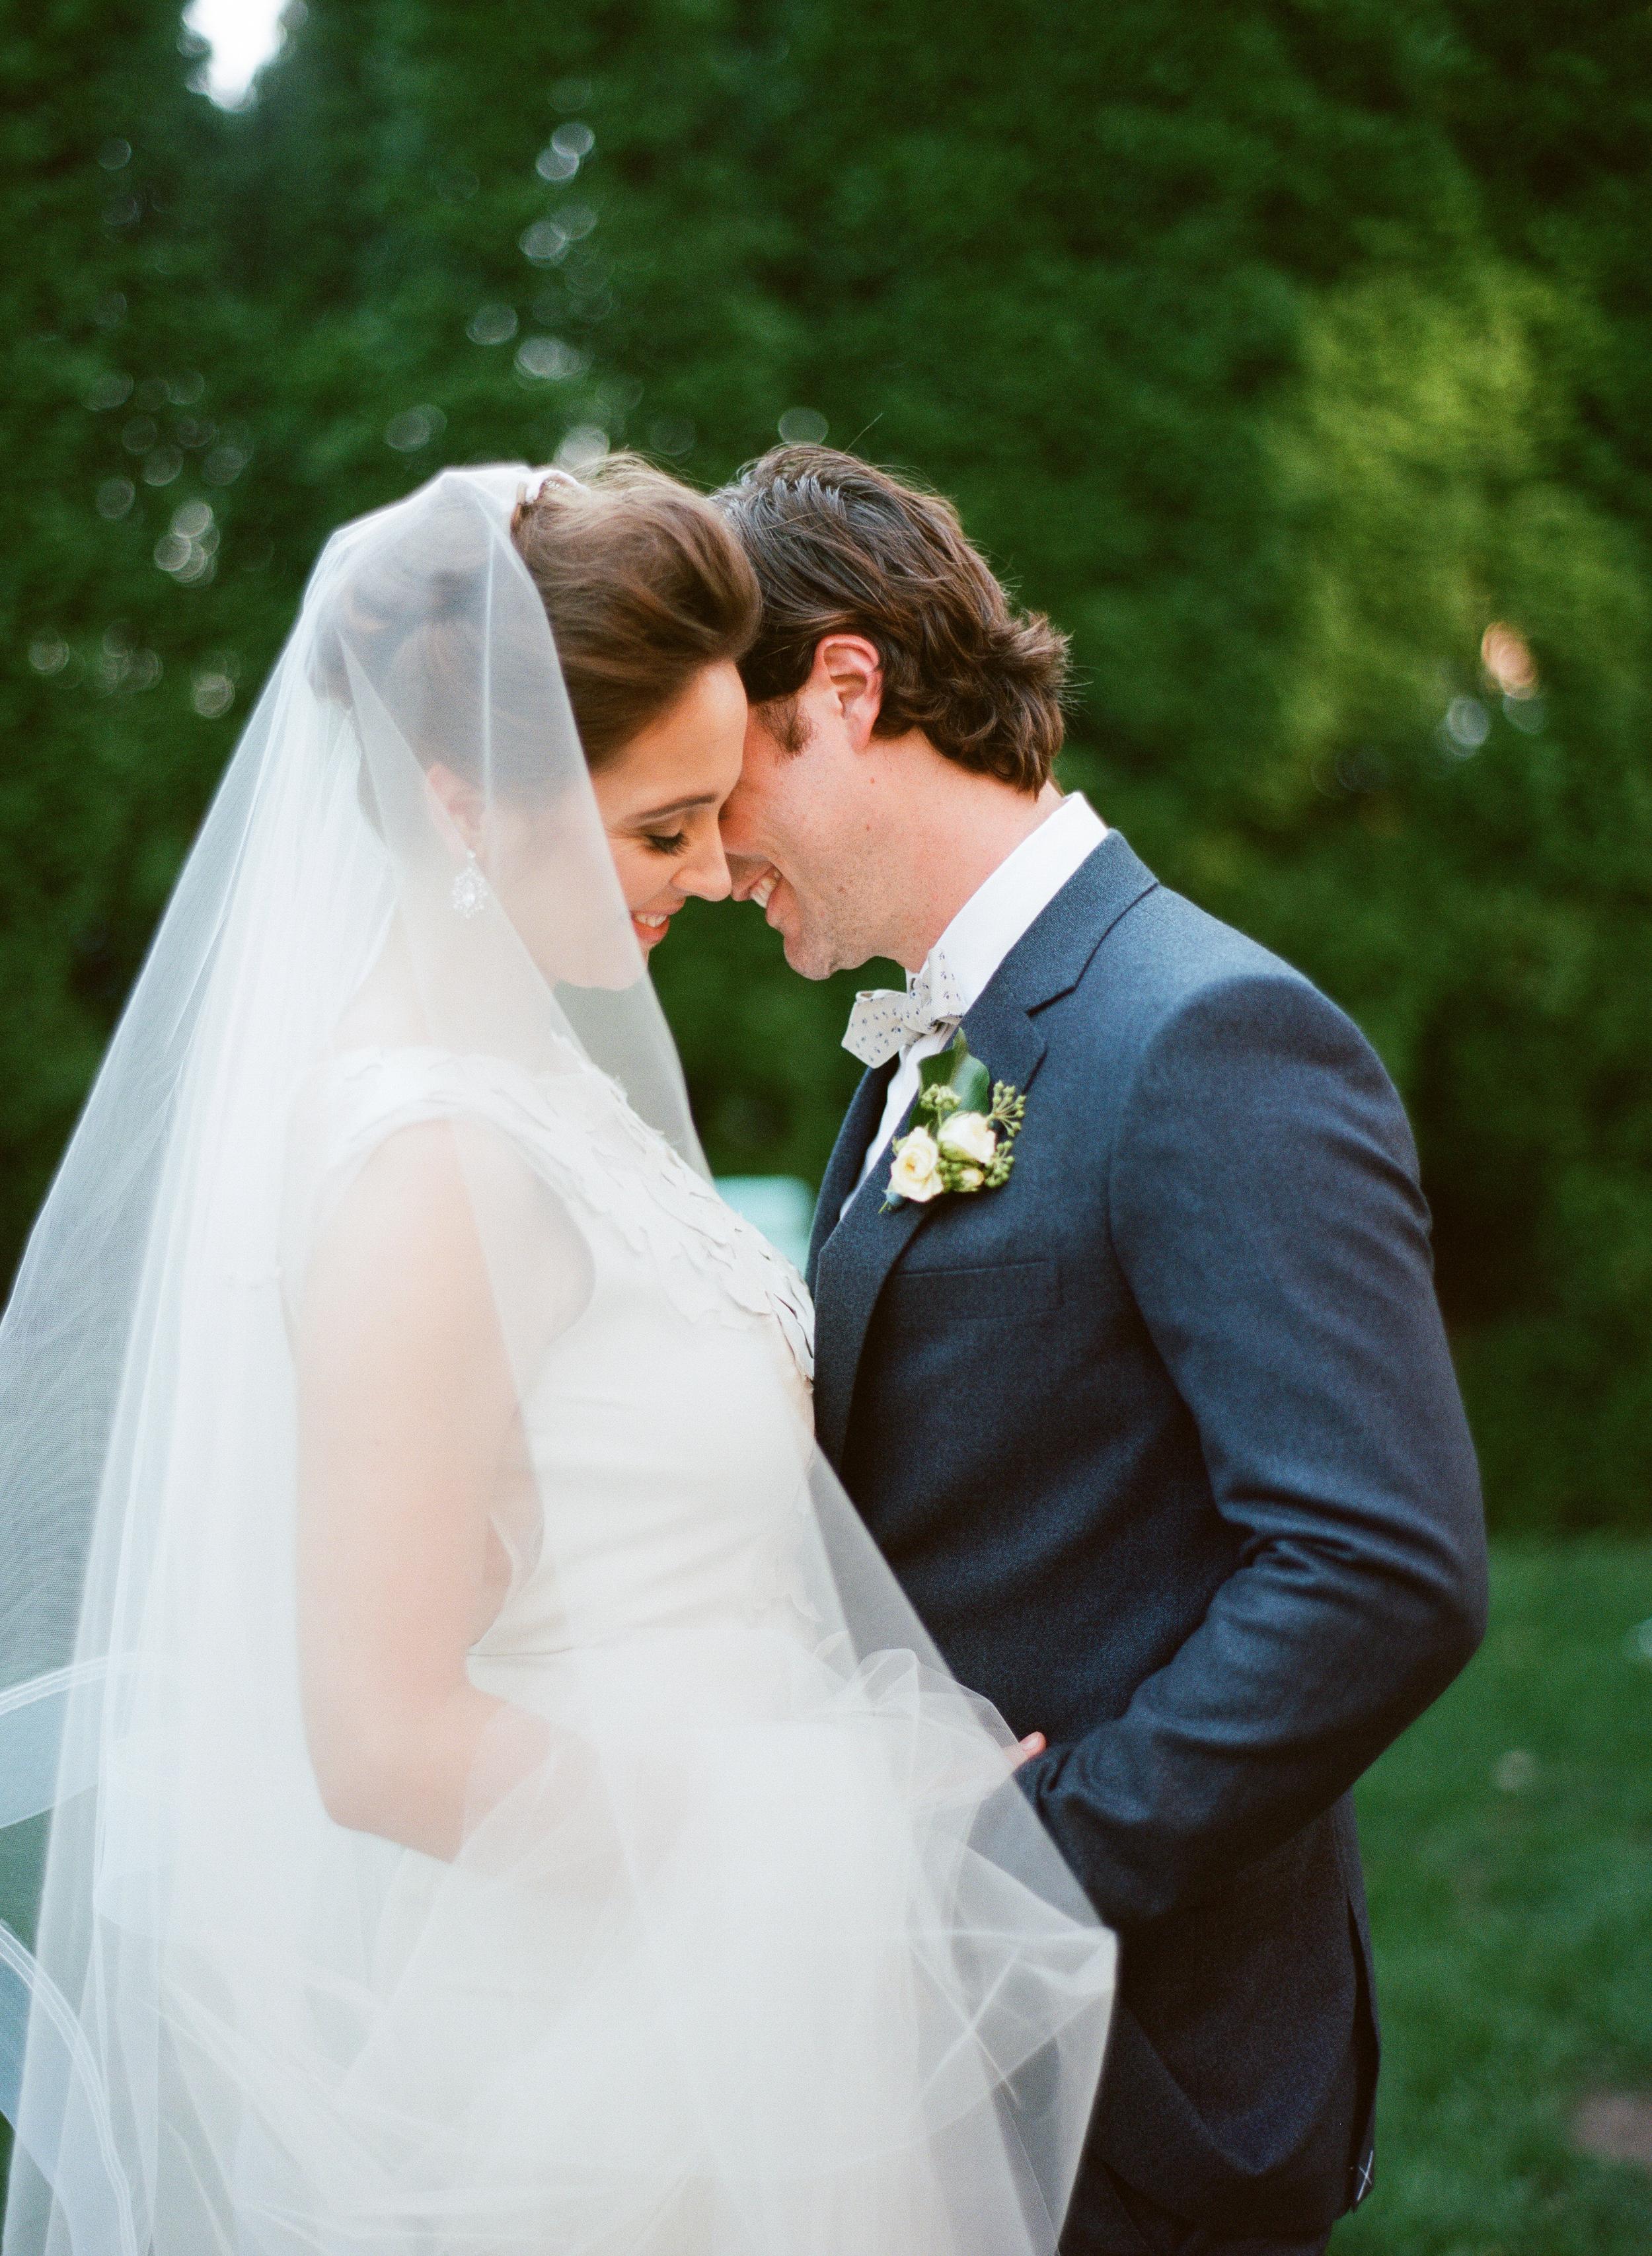 hannah_shih_hanaluluco_cj_isaac_charlie_juliet_ombre_chambray_prospect_park_brooklyn_wedding_29.jpg